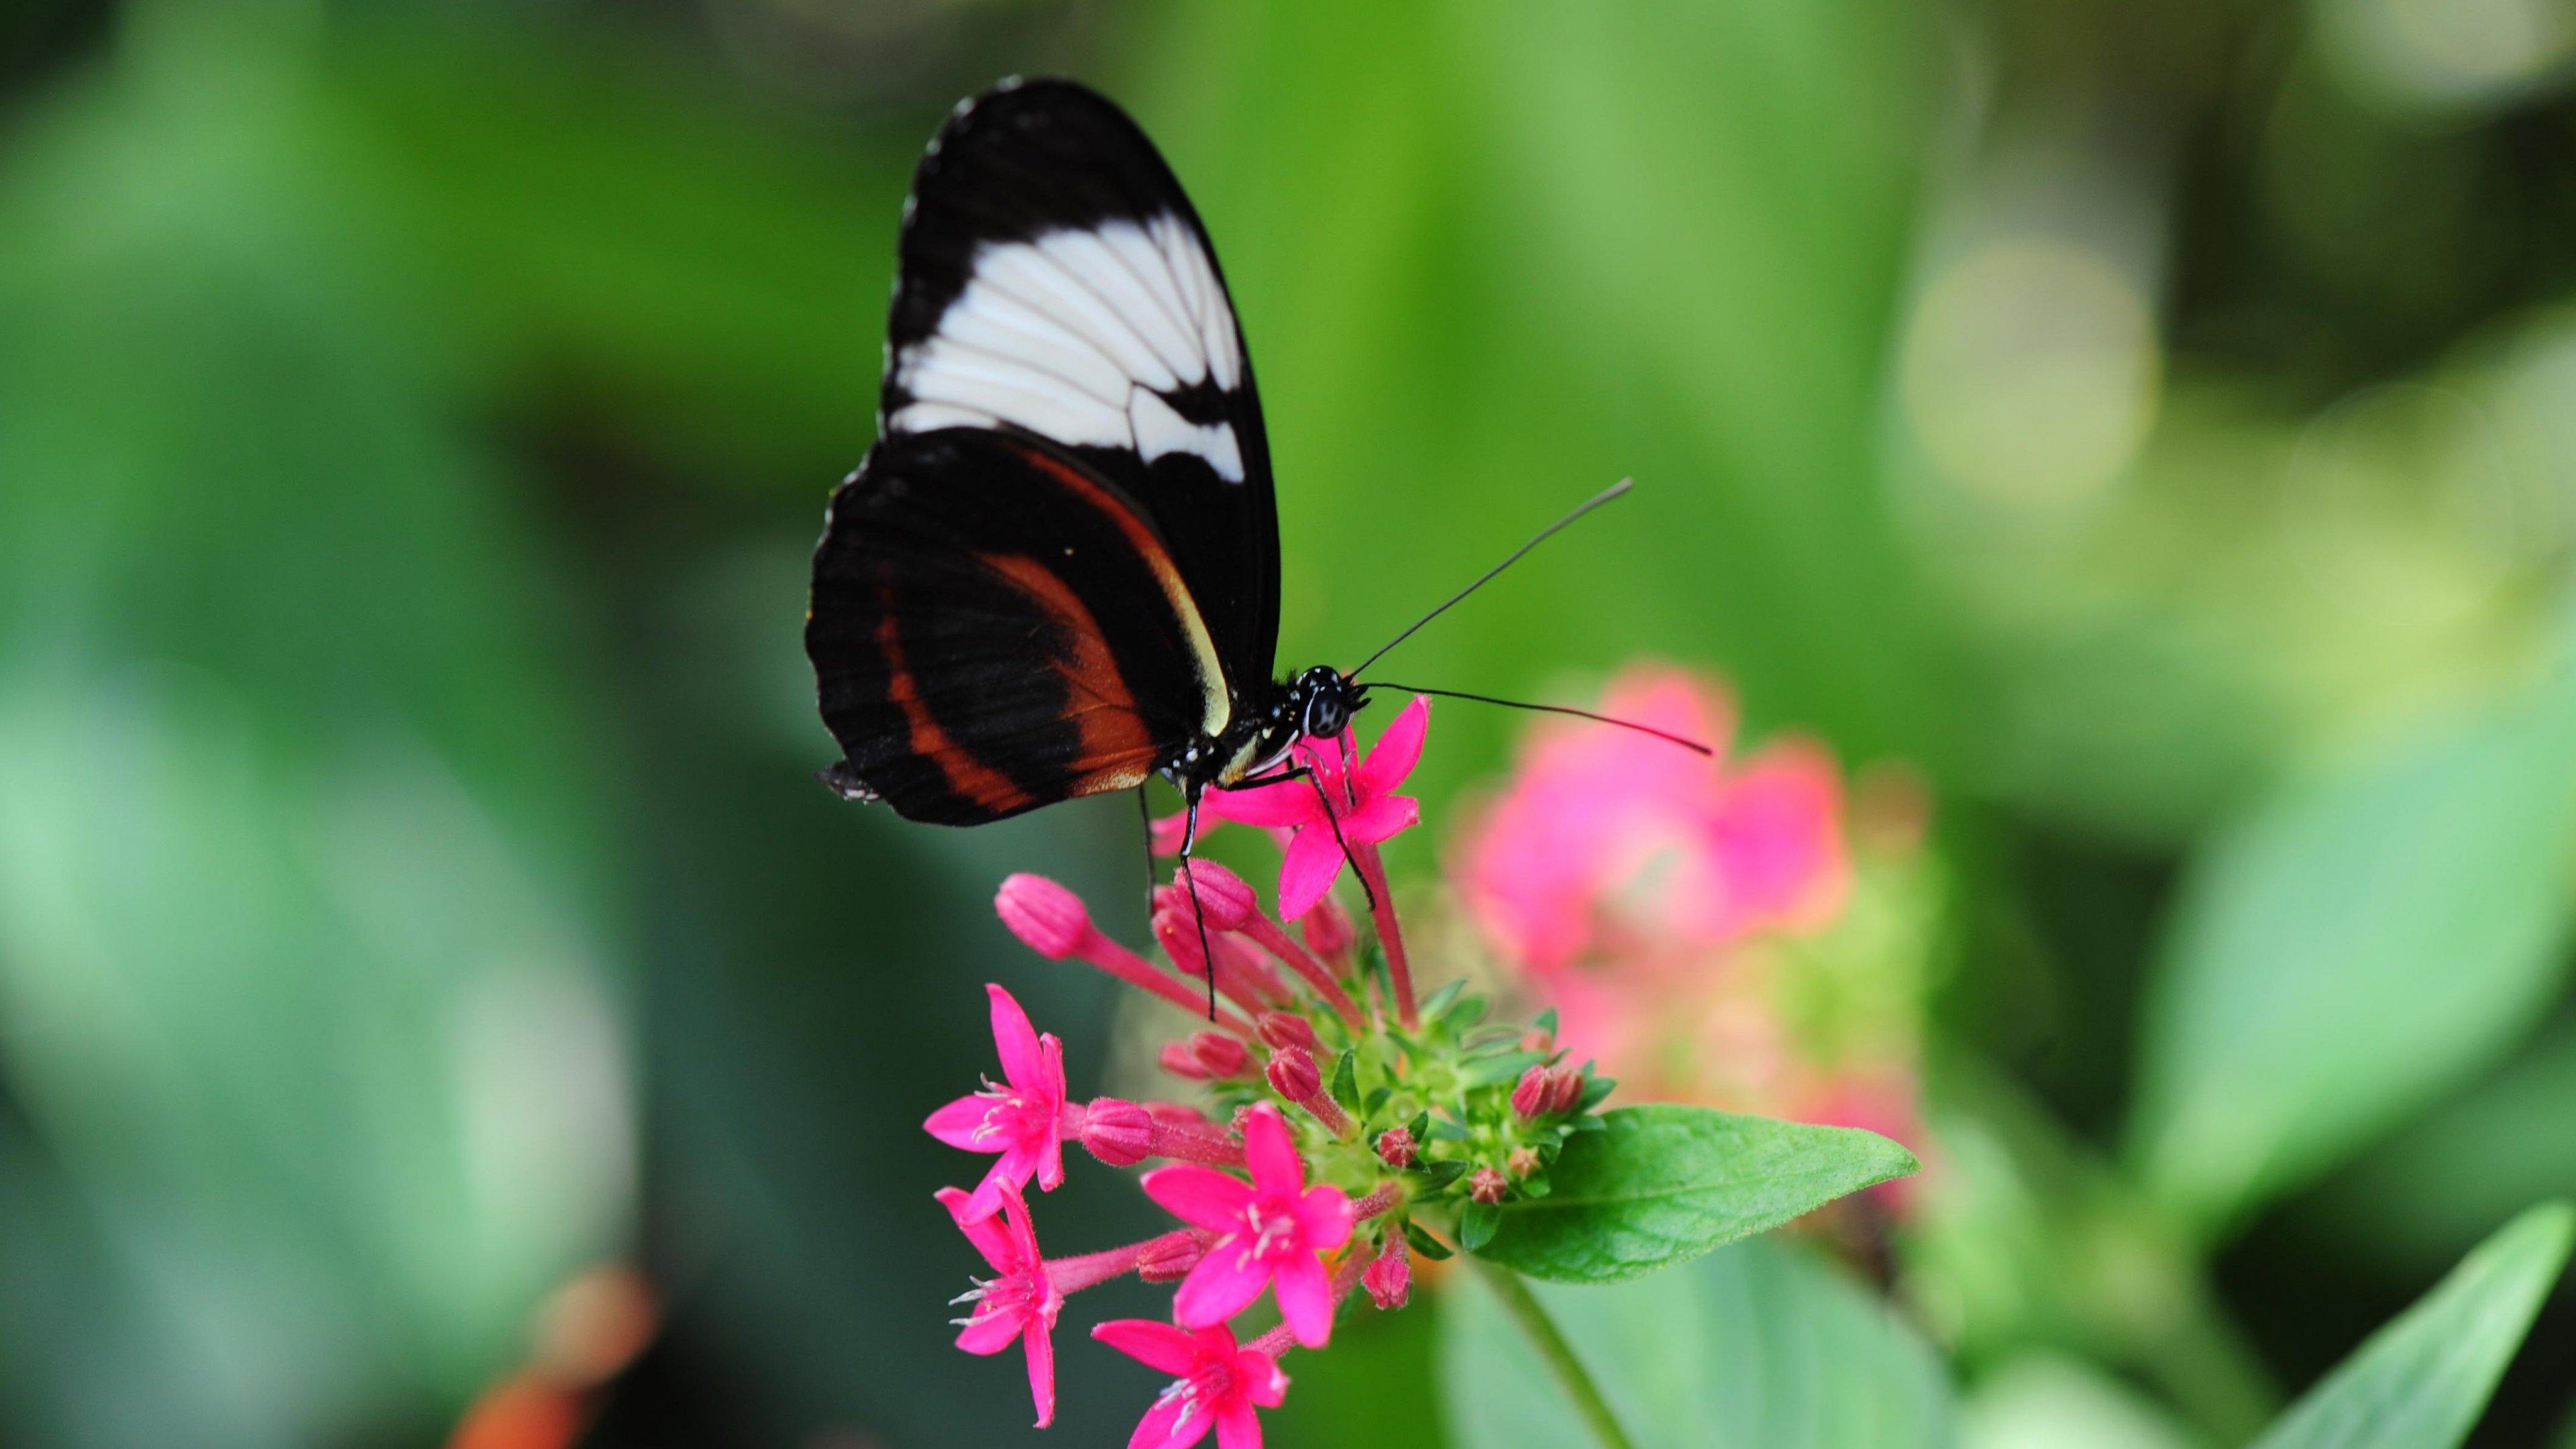 Butterfly Wallpaper Hd For Mobile , HD Wallpaper & Backgrounds